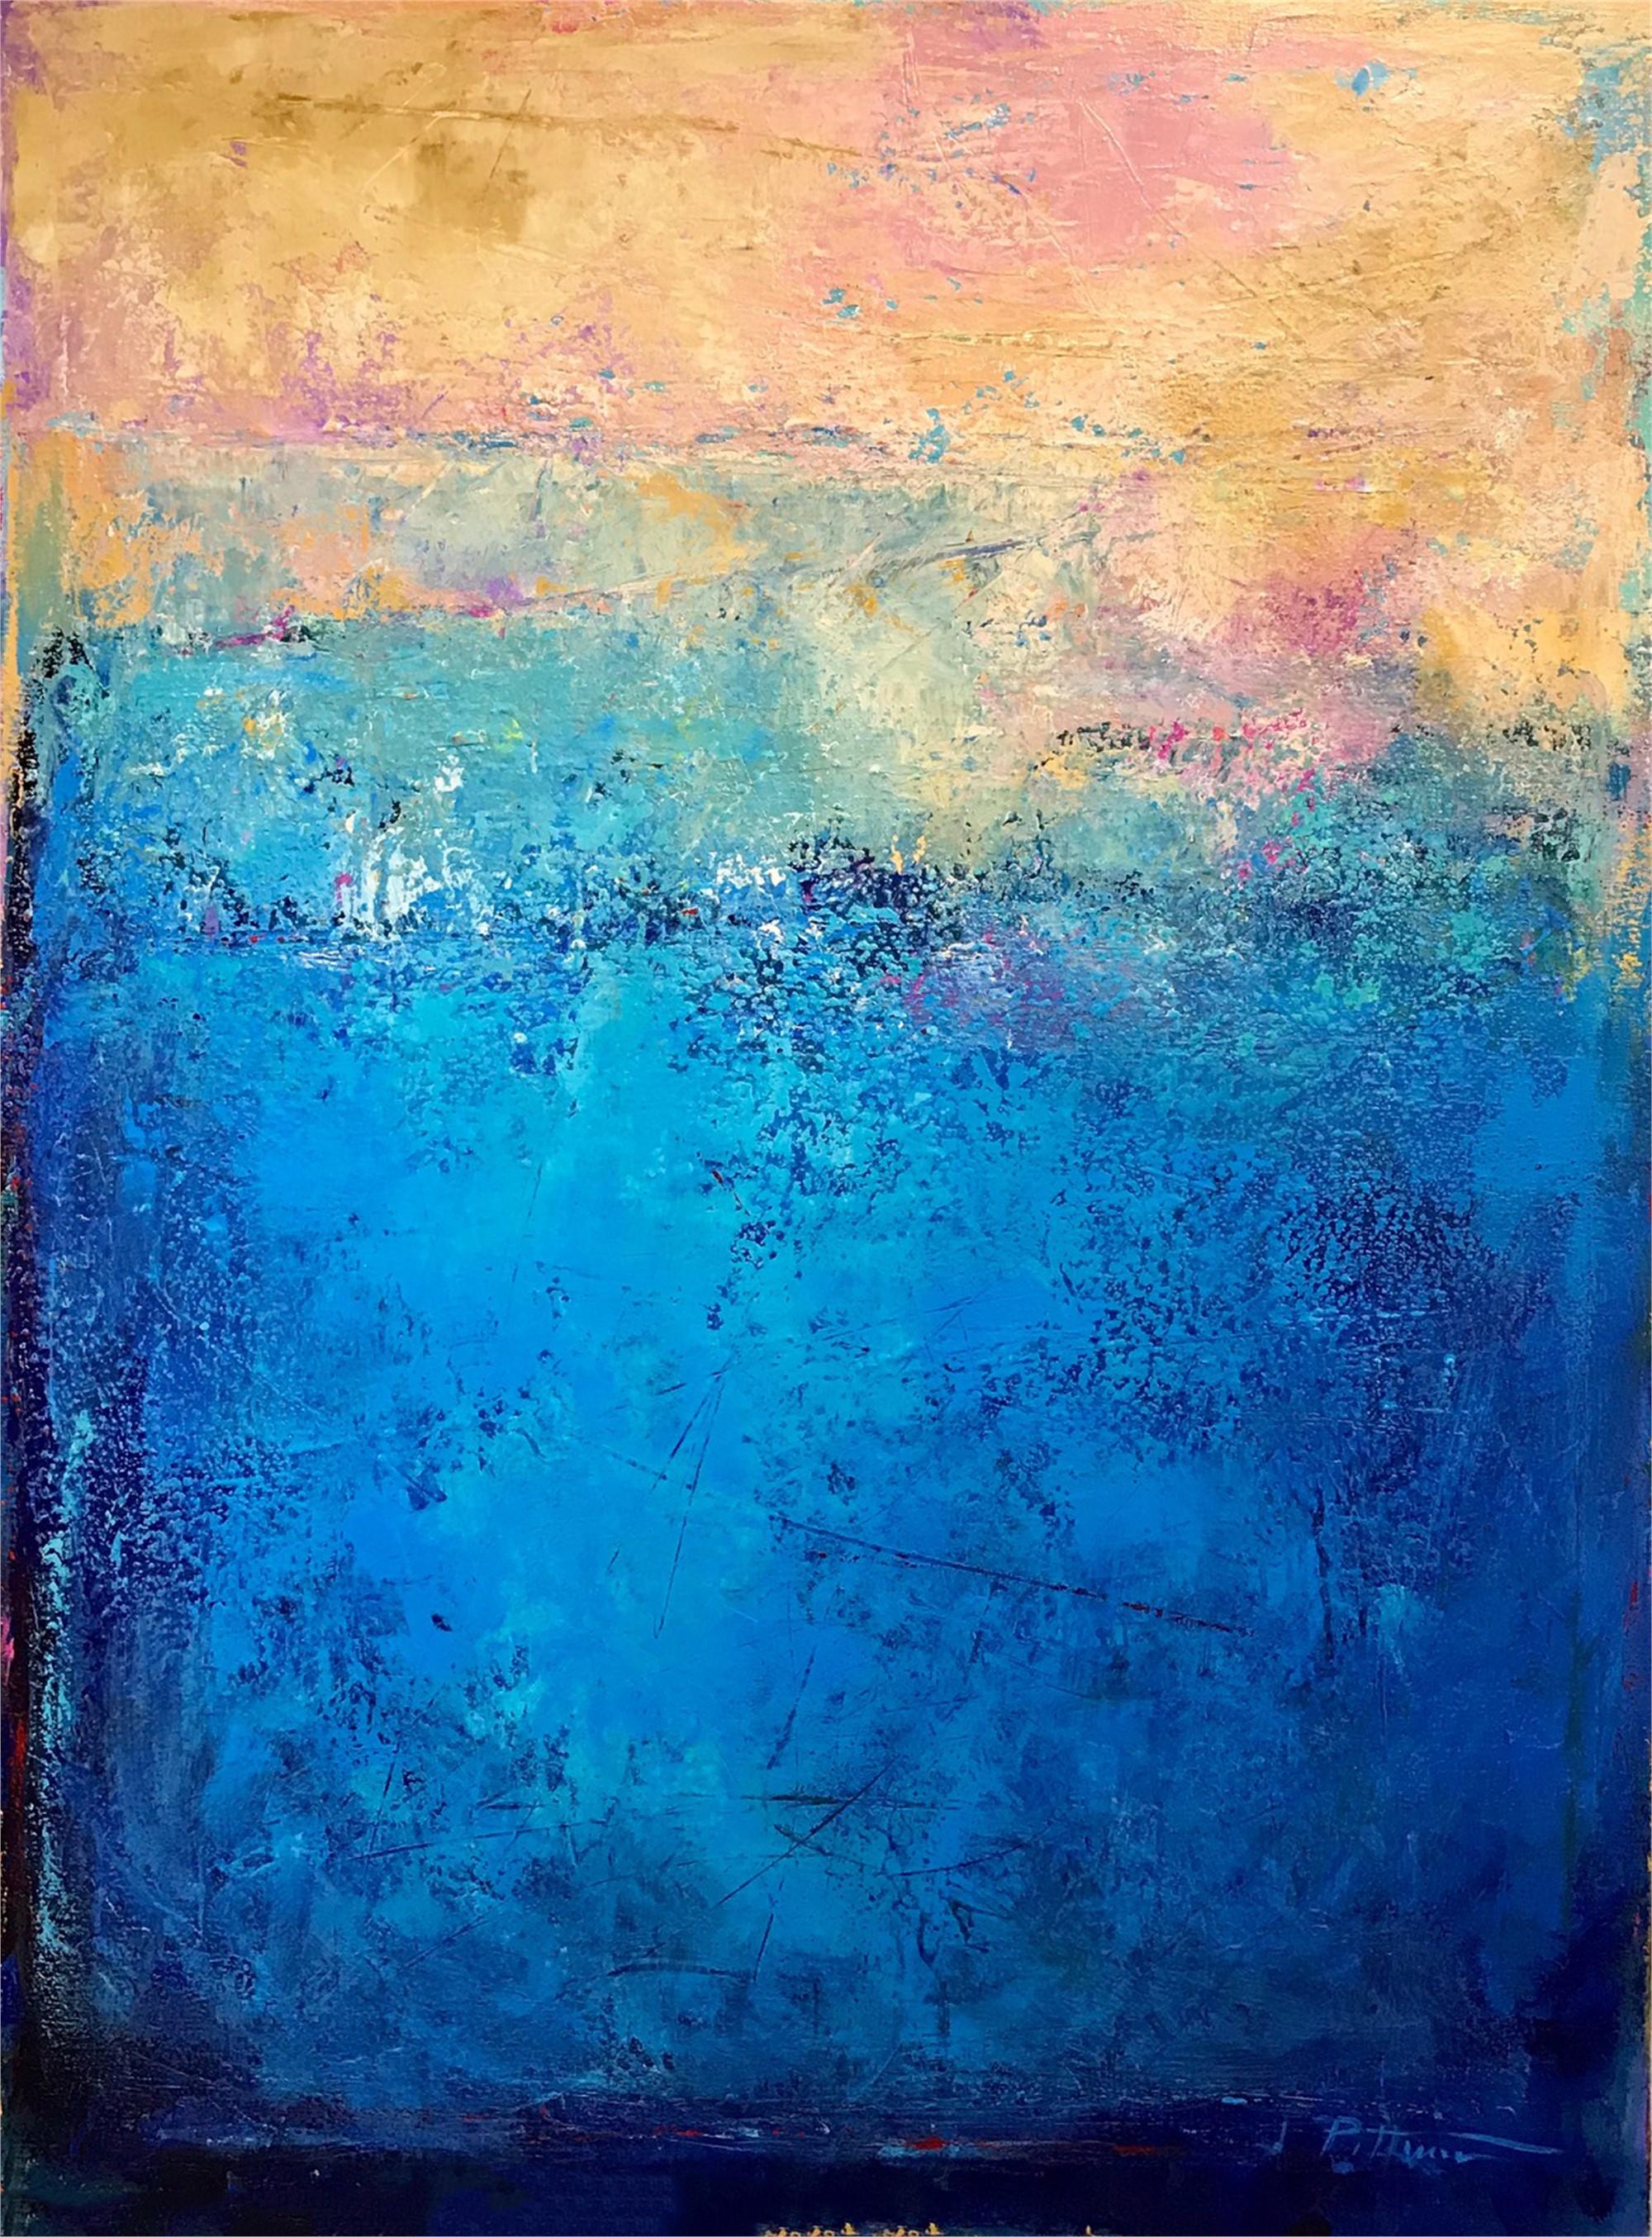 Ocean 5 by Jim Pittman